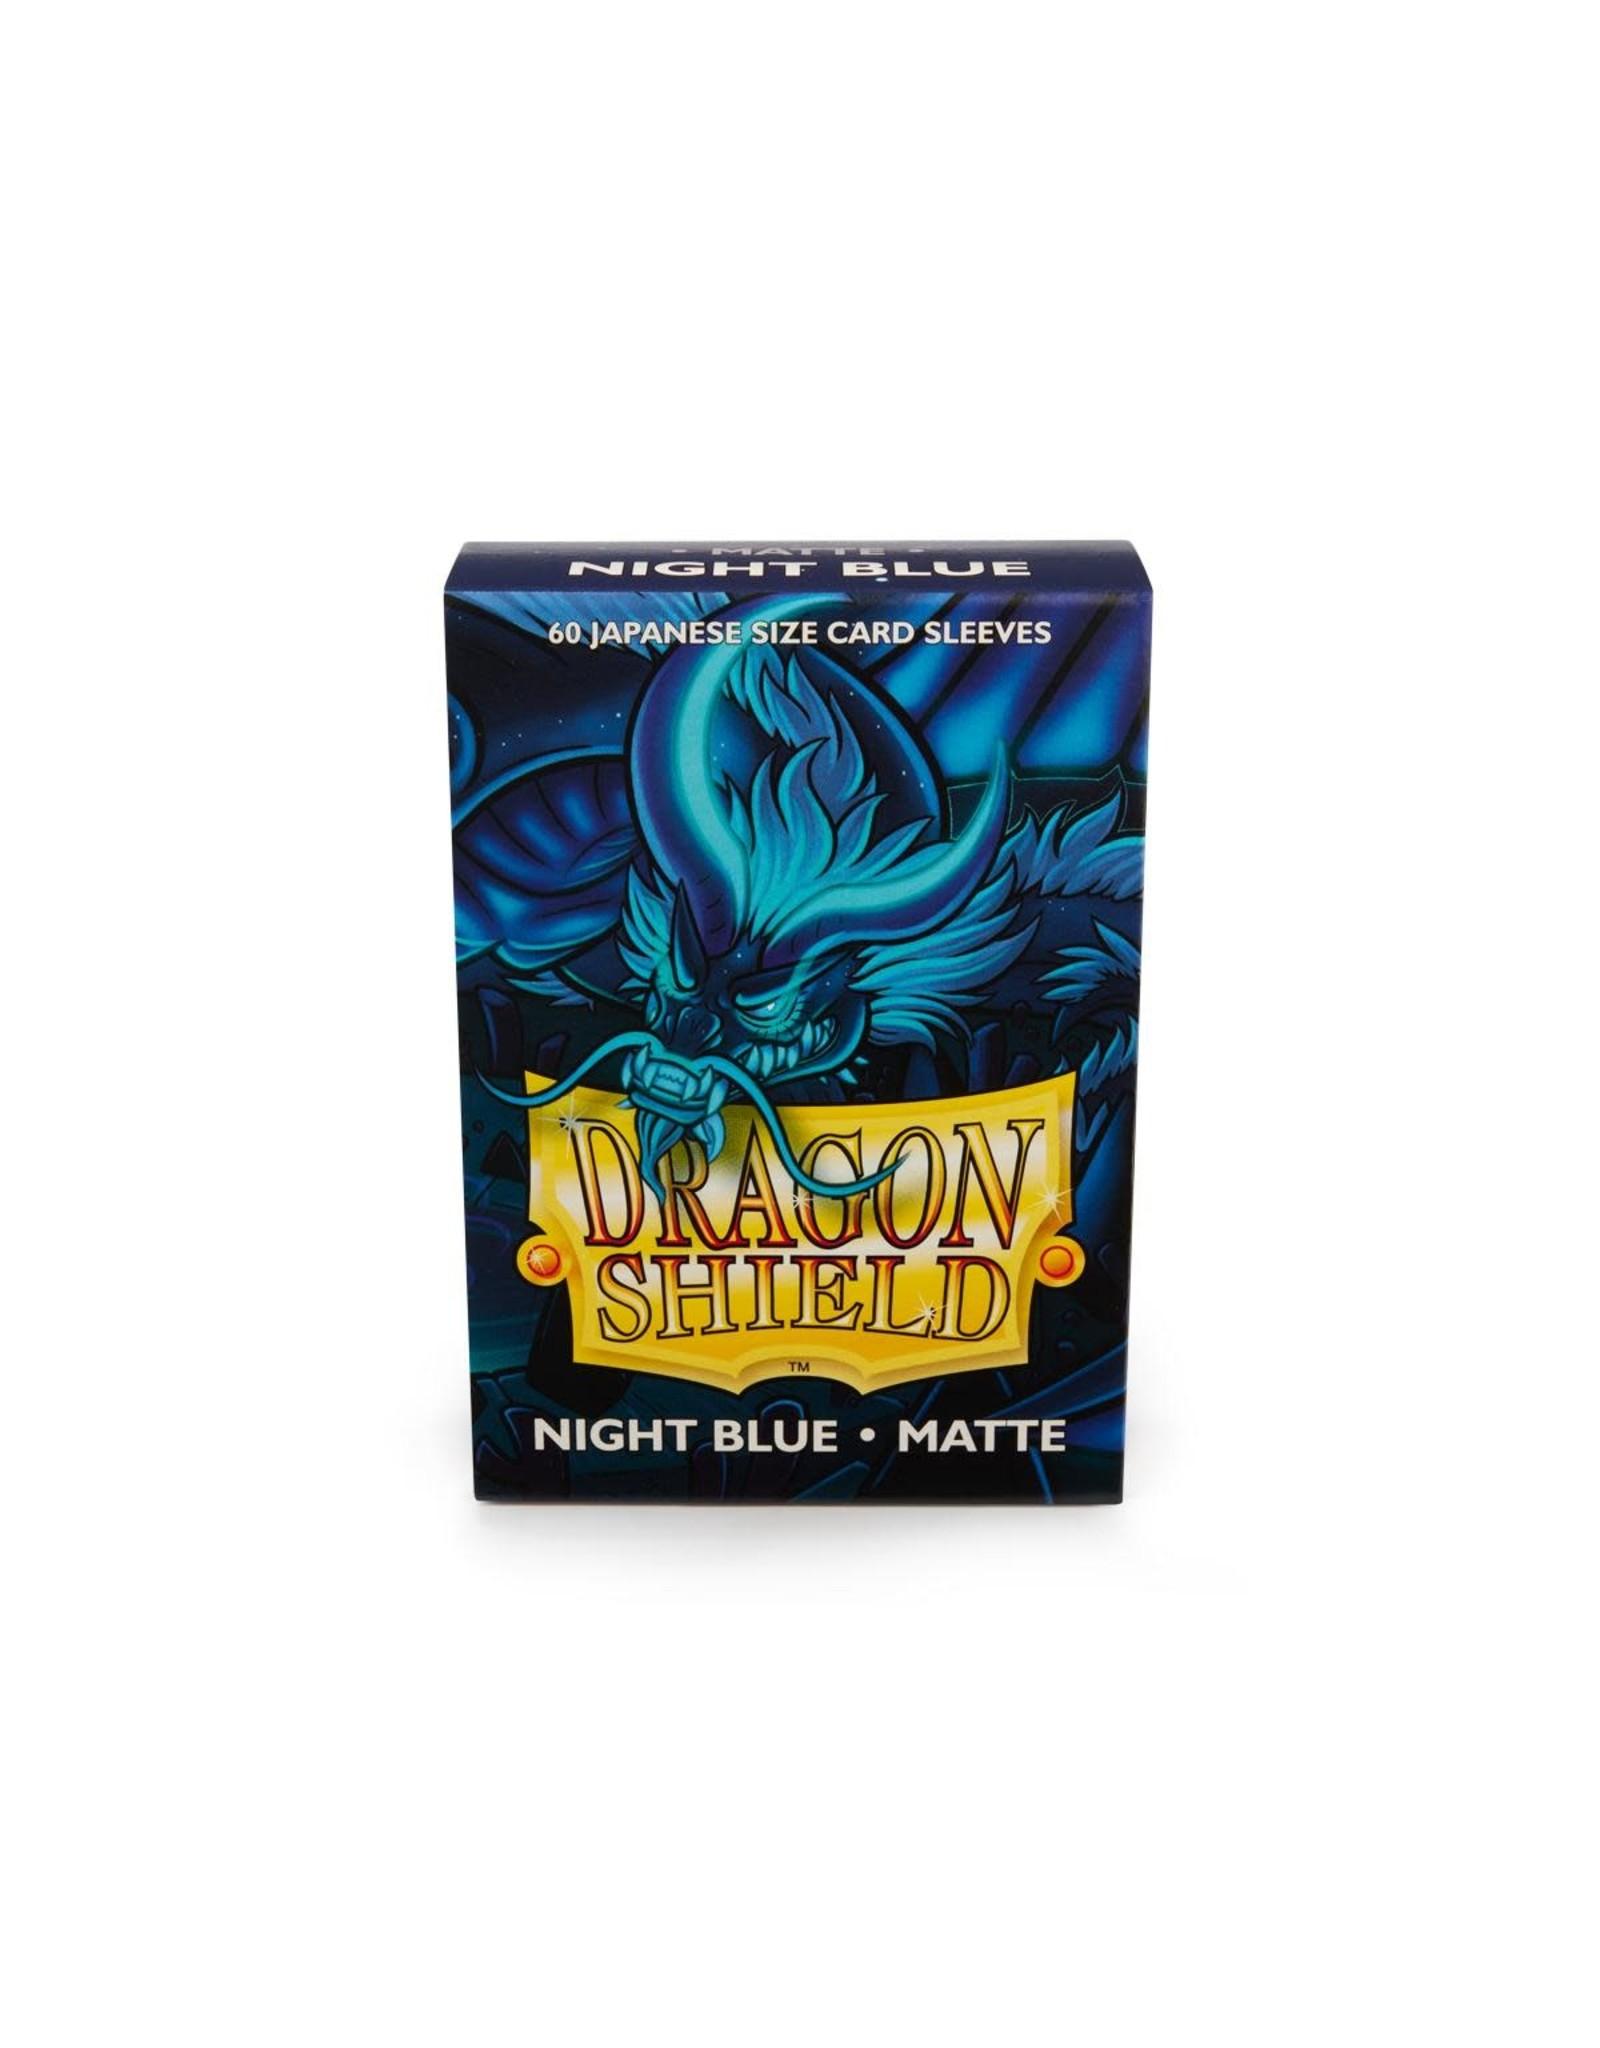 DRAGON SHIELD MINI SLEEVES: Matte Night Blue